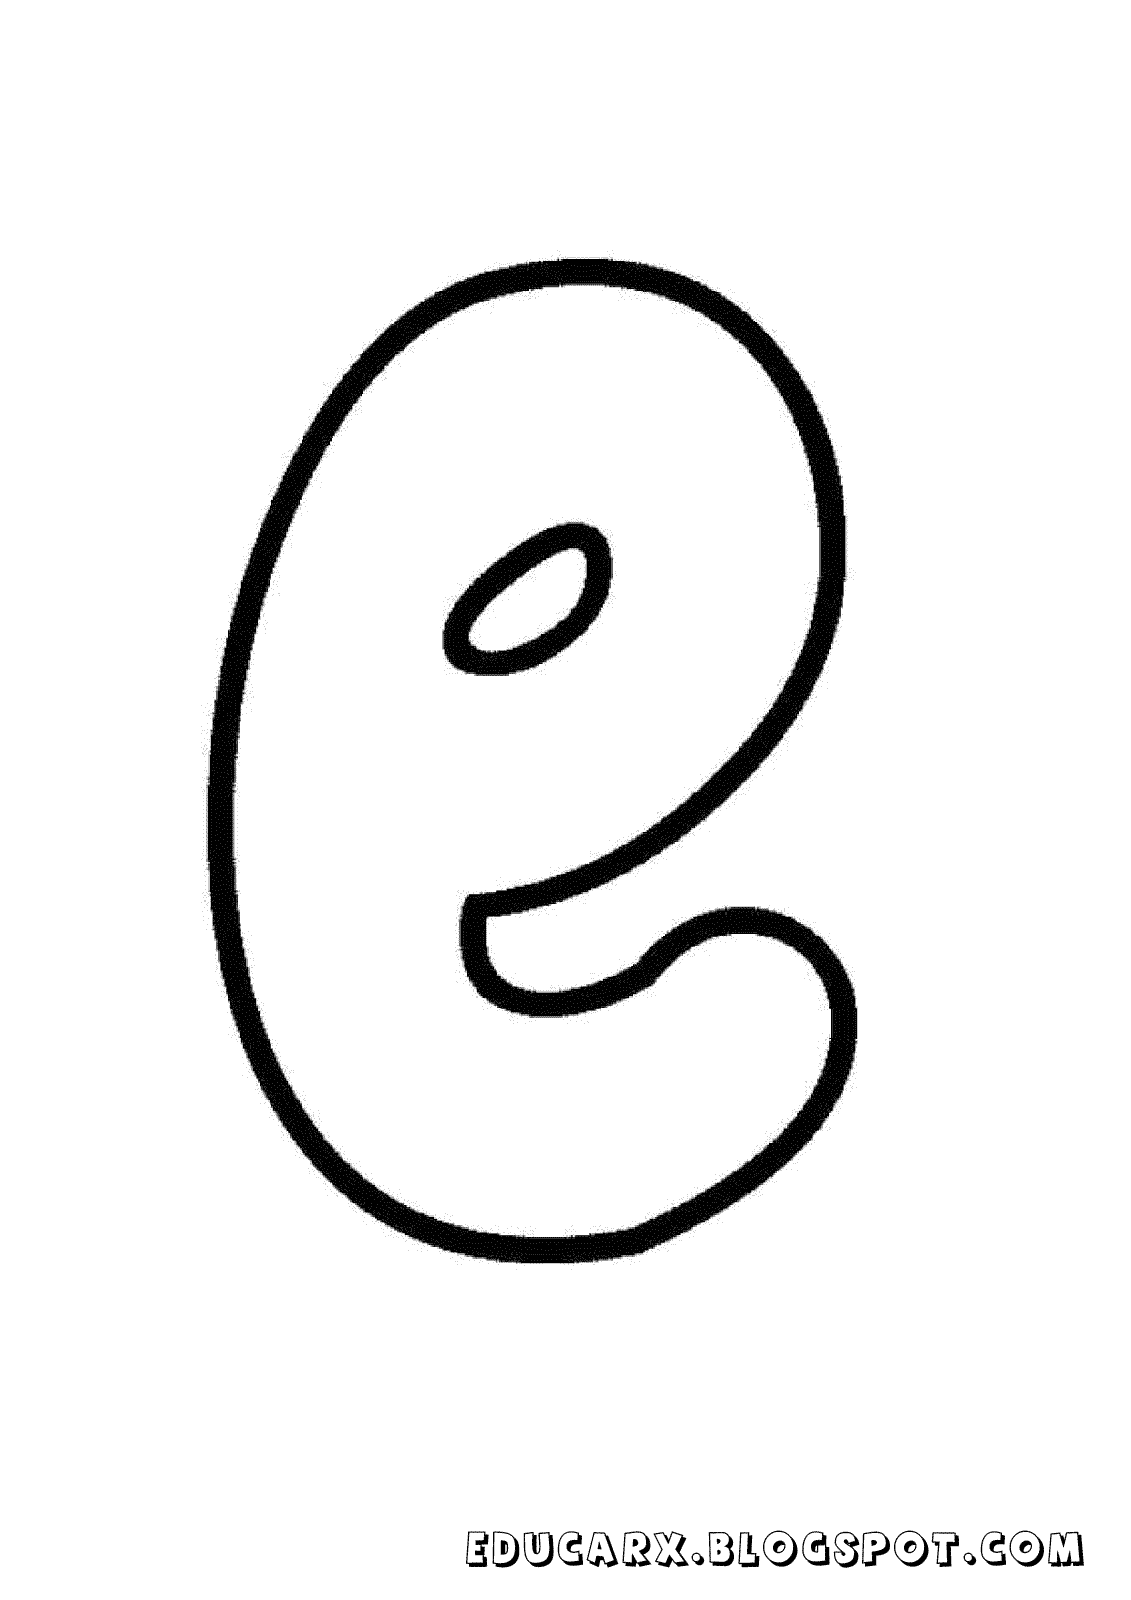 Molde da letra minuscula e